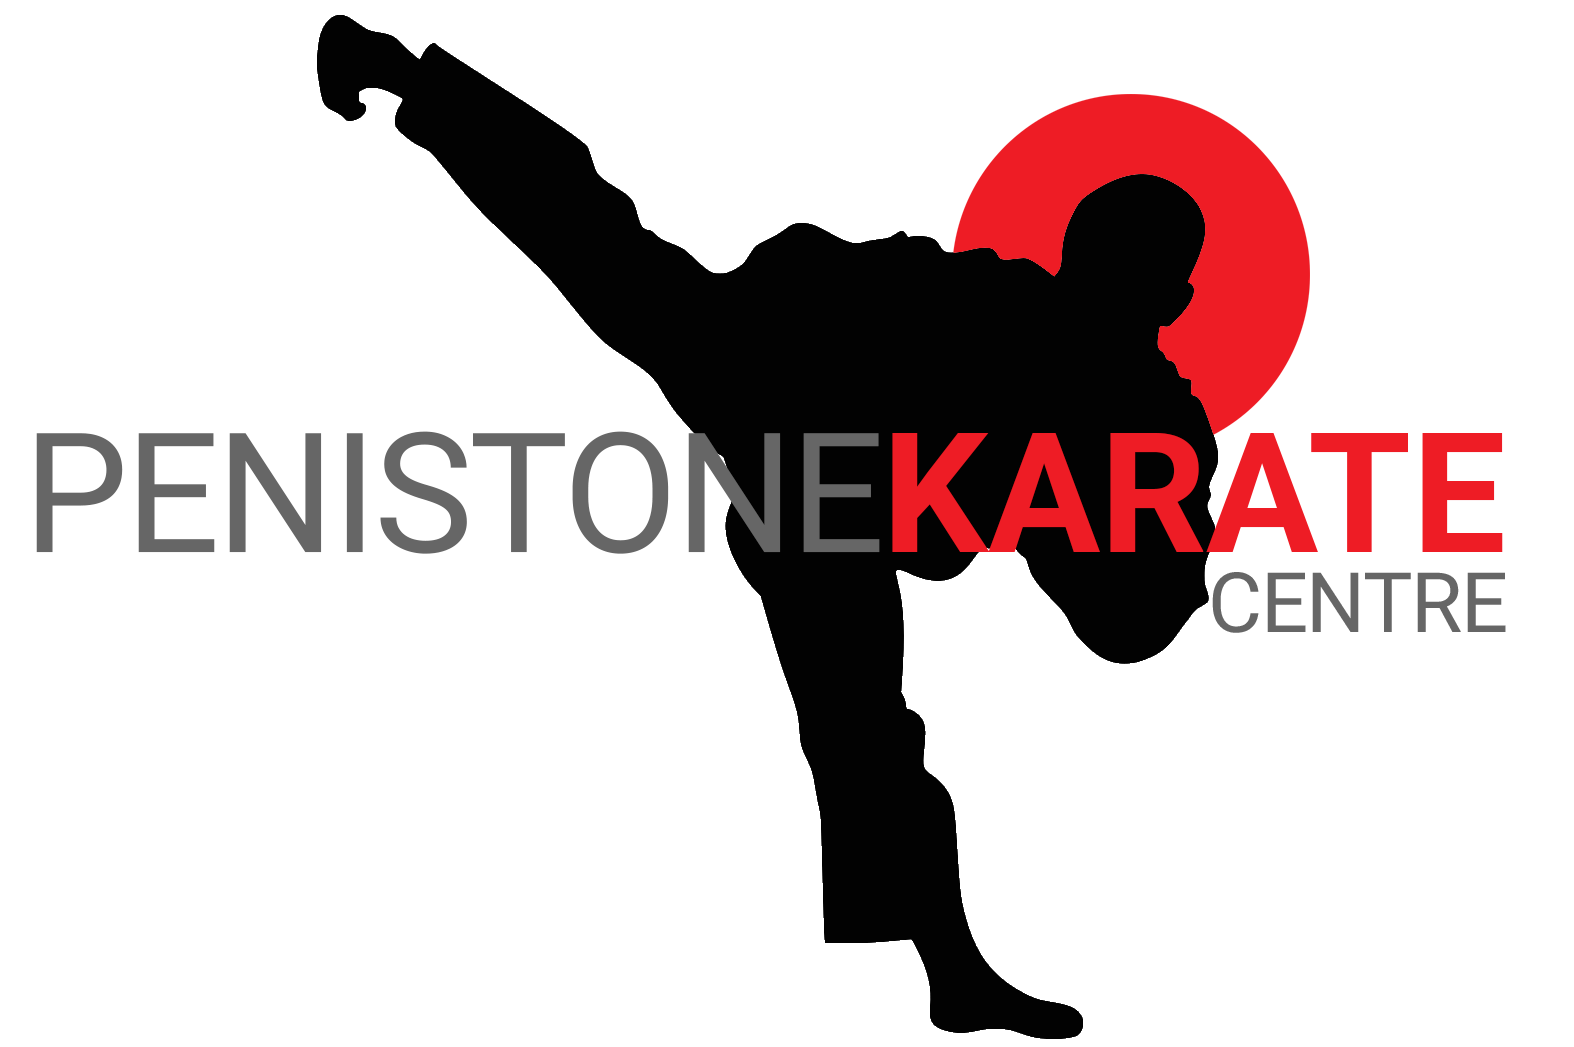 Karate | Penistone Karate Centre